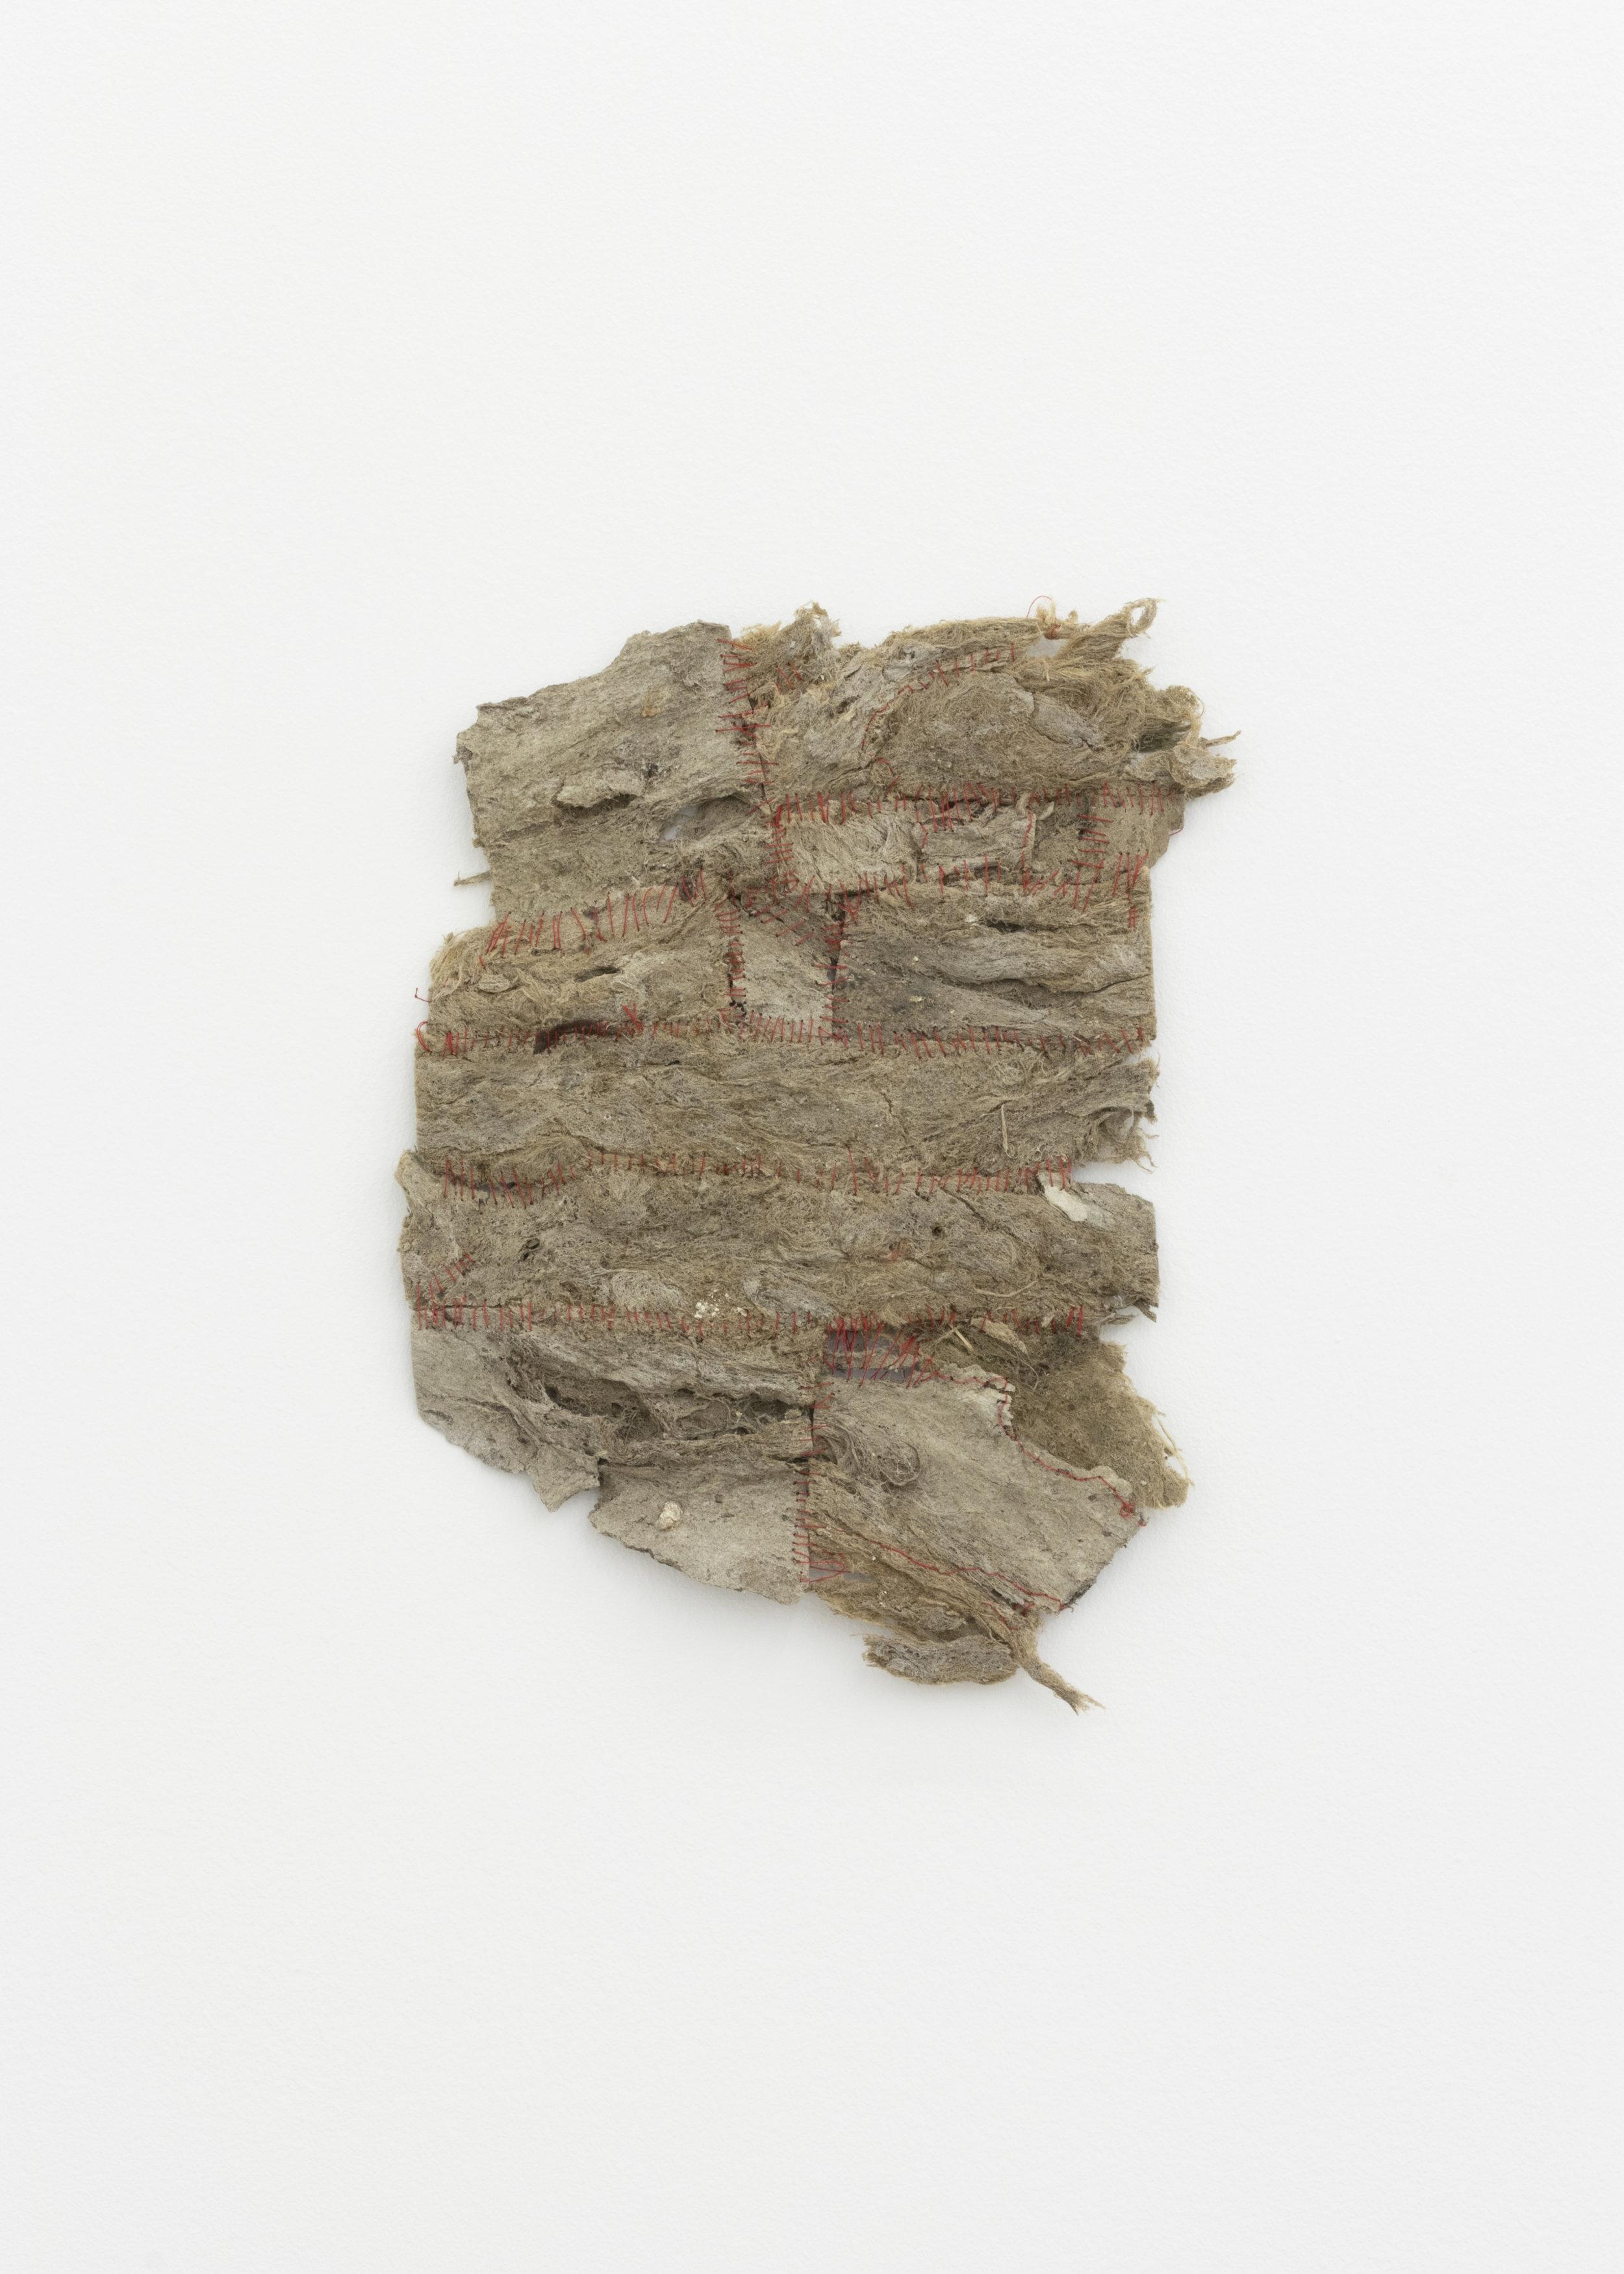 LA River Paper,  2018, naturally occuring paper (algae, leaves, bird materials), thread, 14 x 11 in.